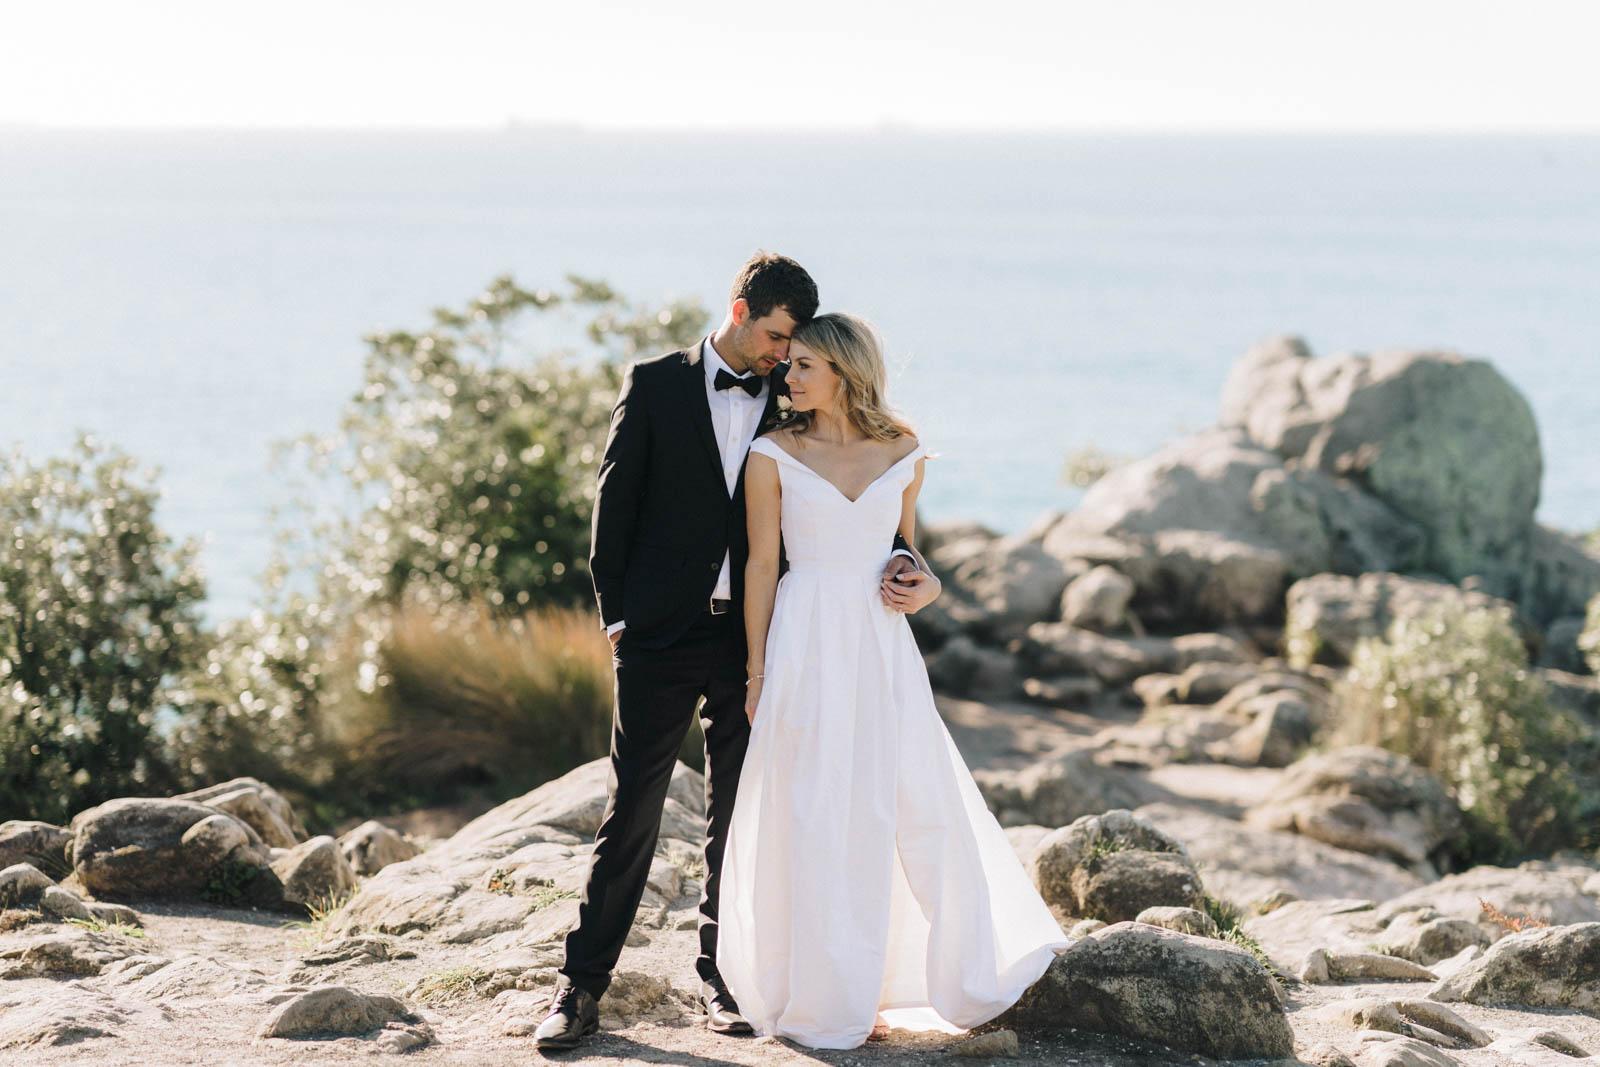 newfound-s-p-mt-maunganui-tauranga-wedding-photographer-1558-A9_05672